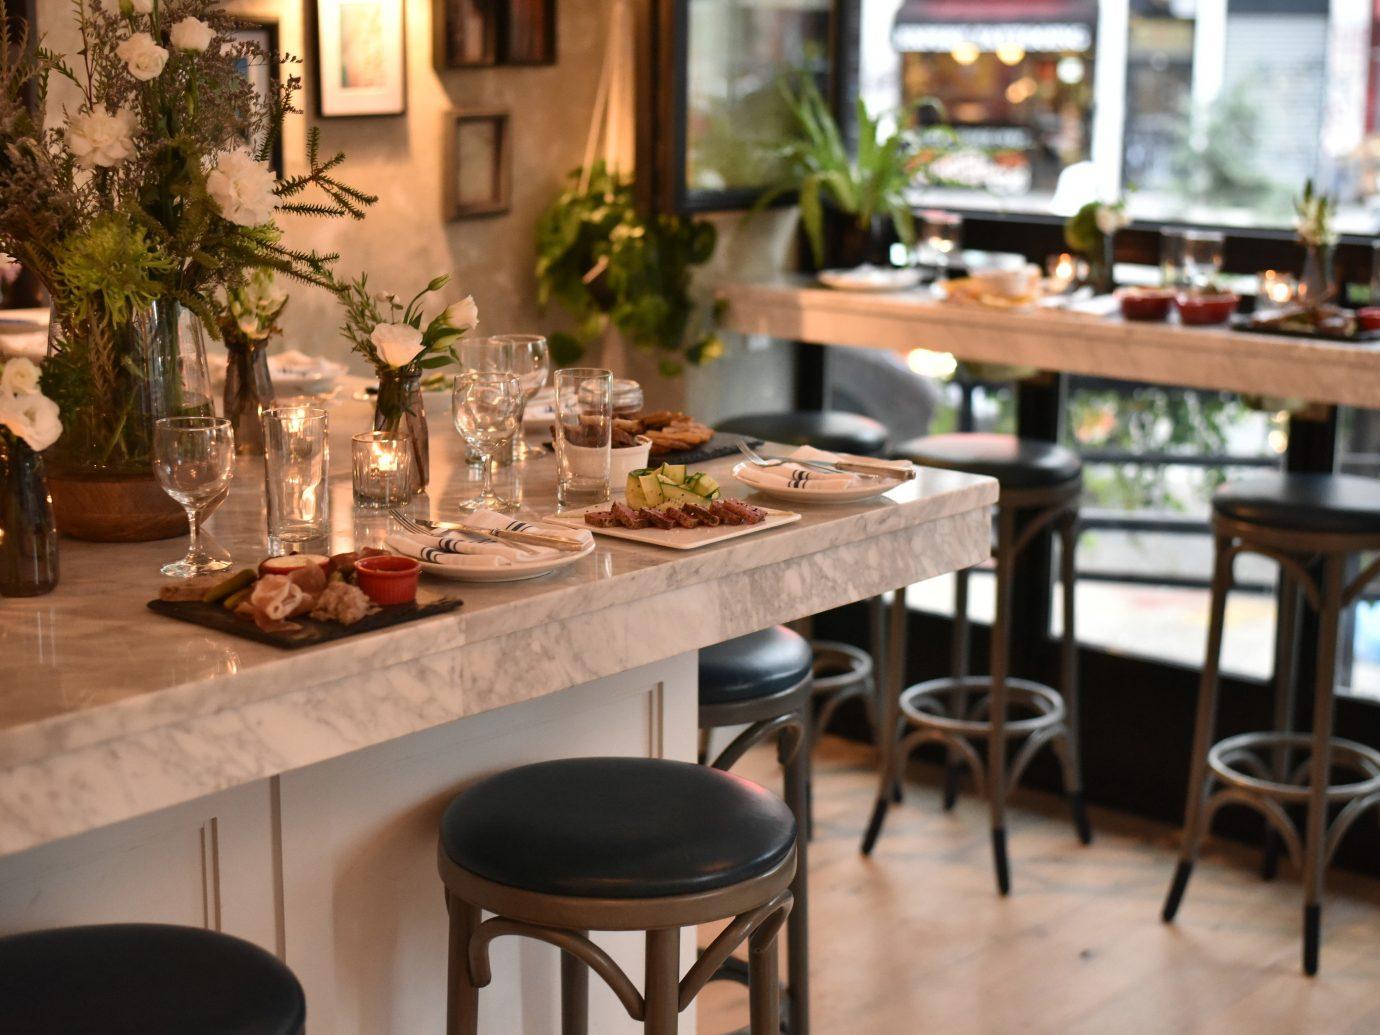 NYC Trip Ideas table indoor window floor restaurant furniture Dining brunch interior design dining room Bar meal dining table